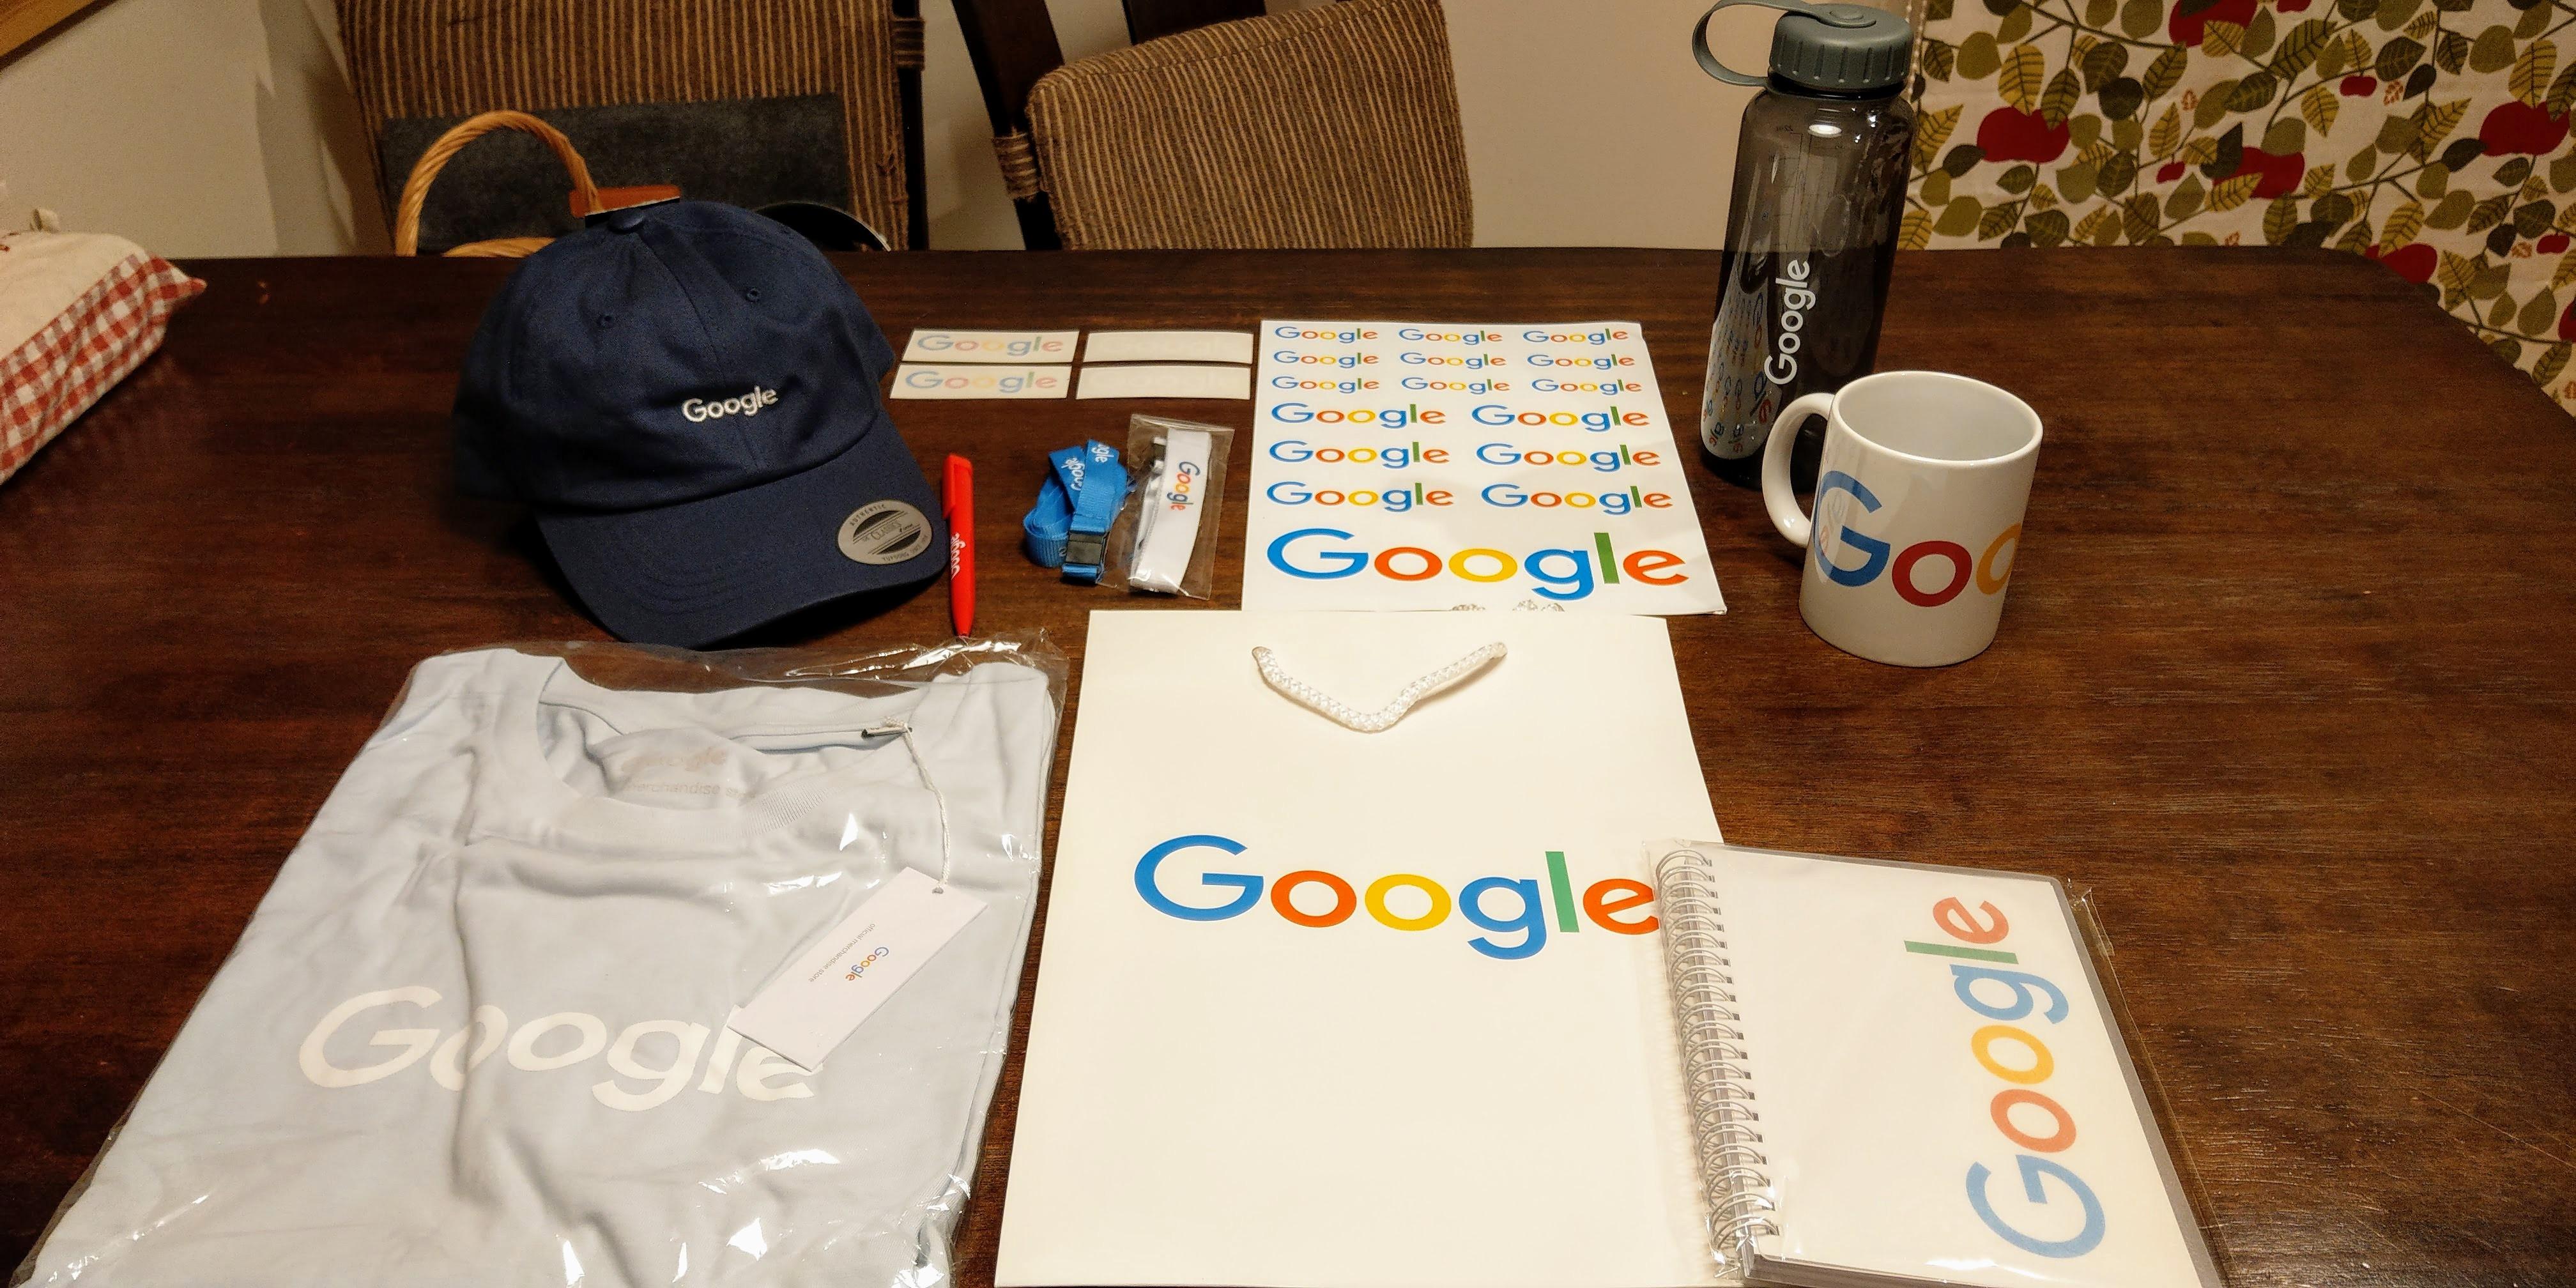 Googleグッズ